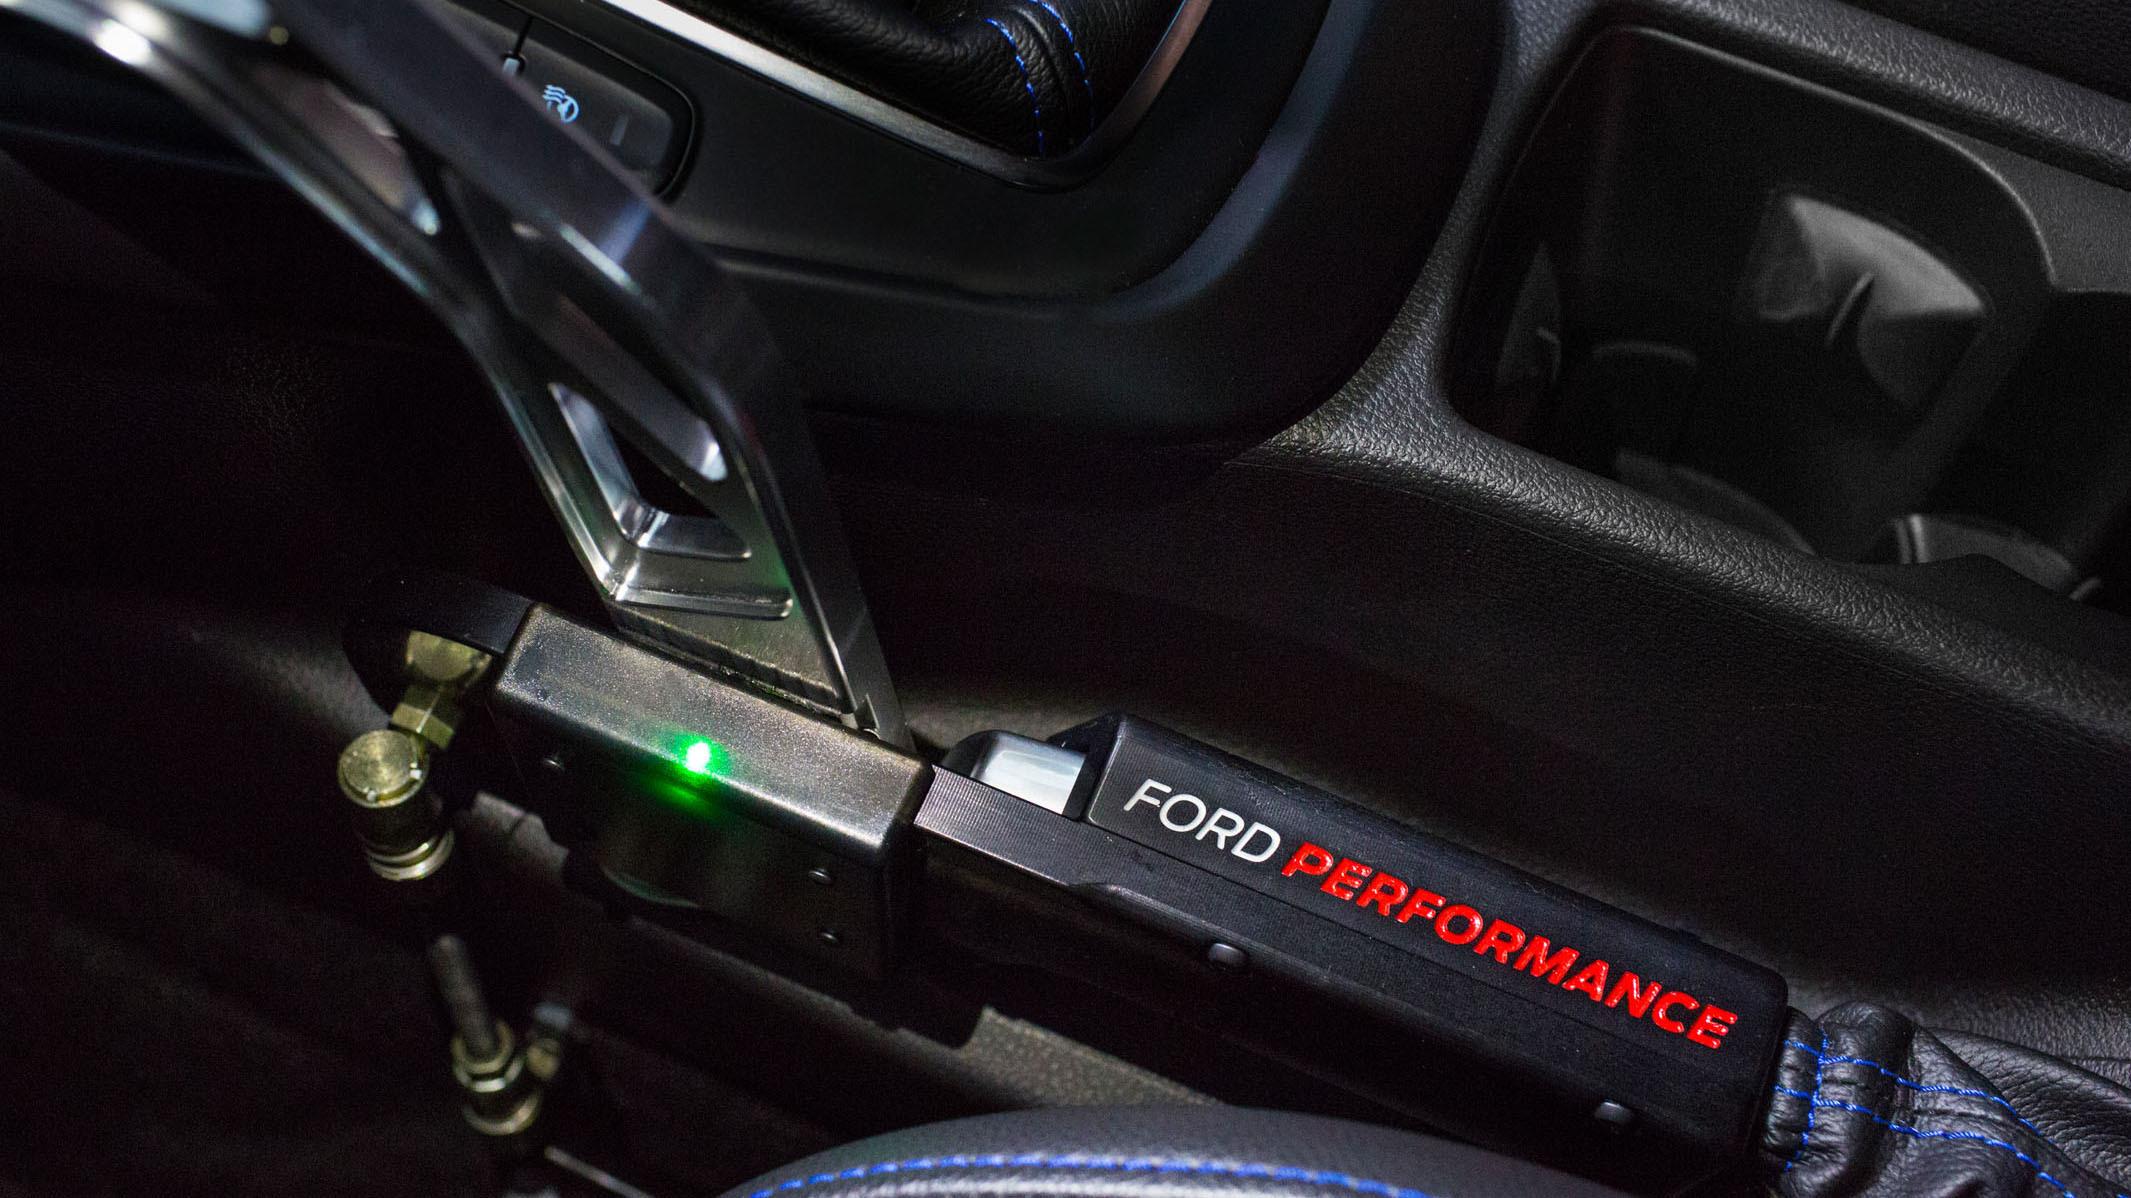 Ford Performance Drift Stick